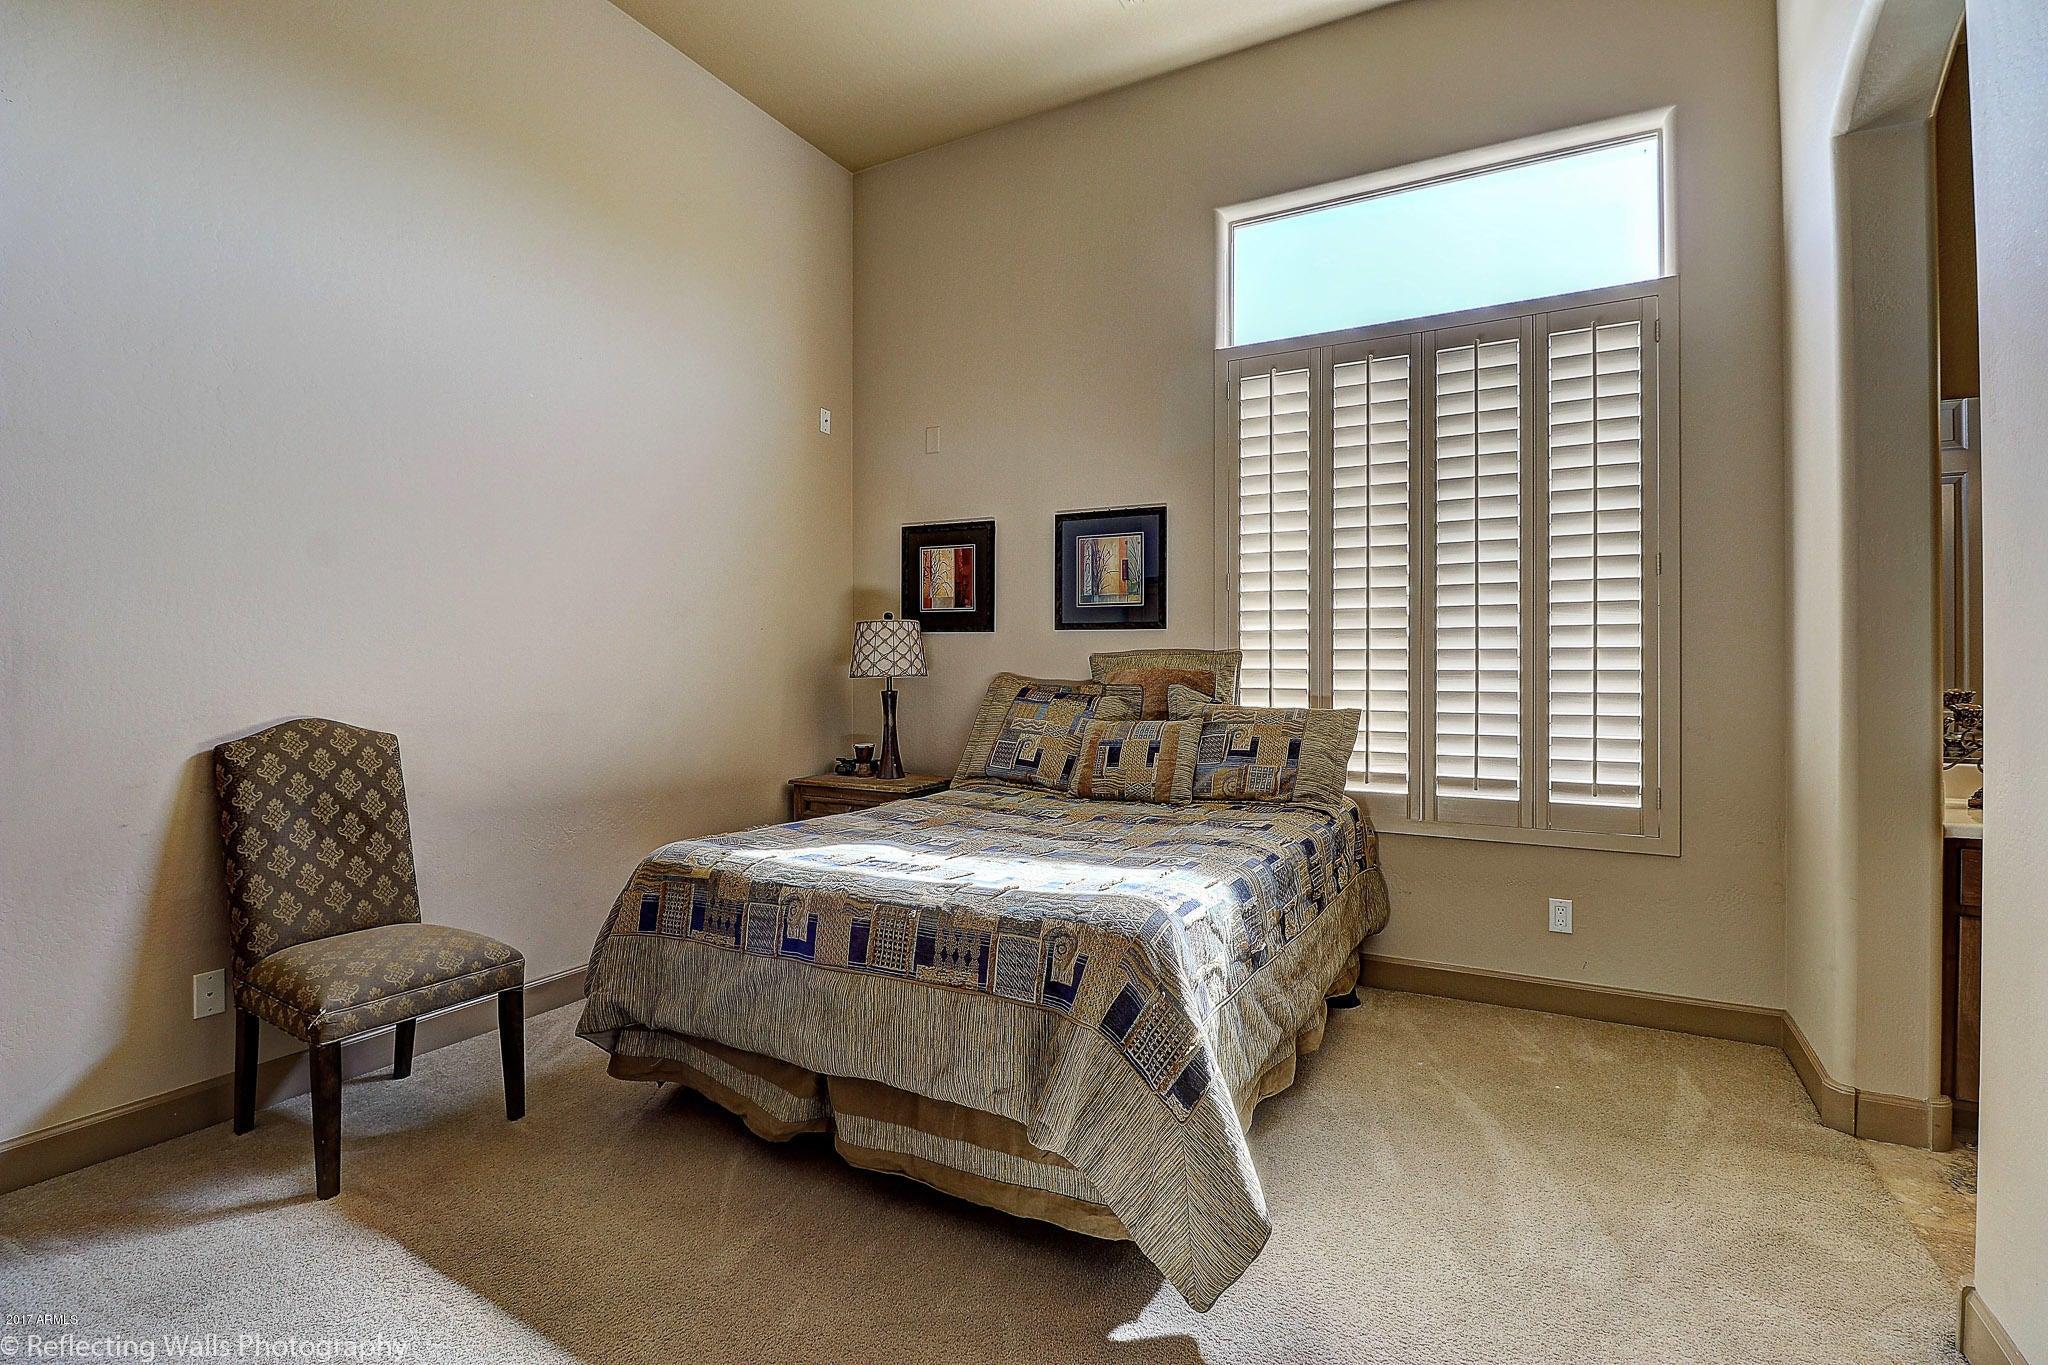 8263 E NIGHTINGALE STAR Drive Scottsdale, AZ 85266 - MLS #: 5678591